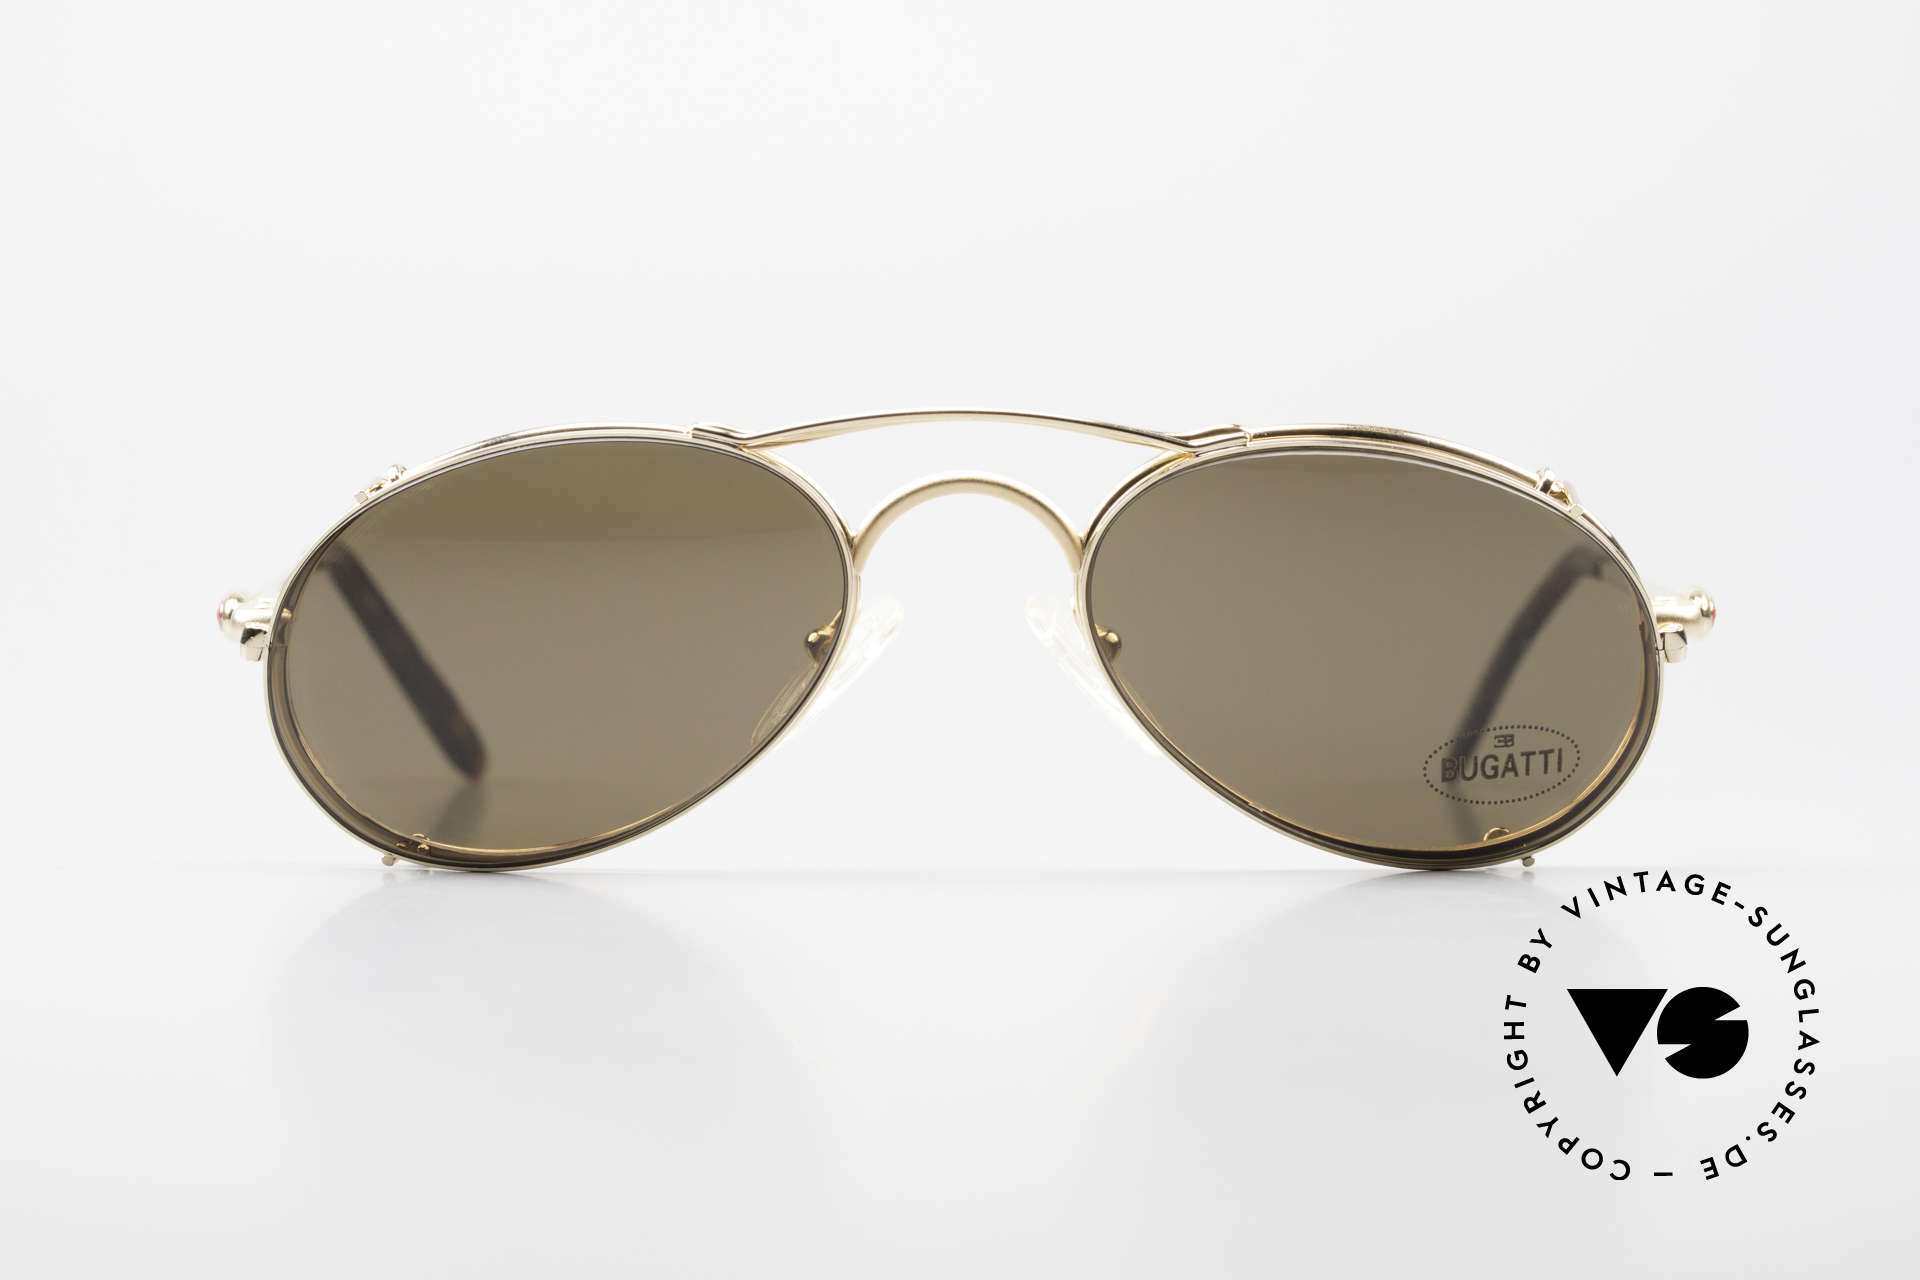 Bugatti 23407 Men's Eyeglasses With Clip On, unworn (like all our rare vintage Bugatti eyewear), Made for Men